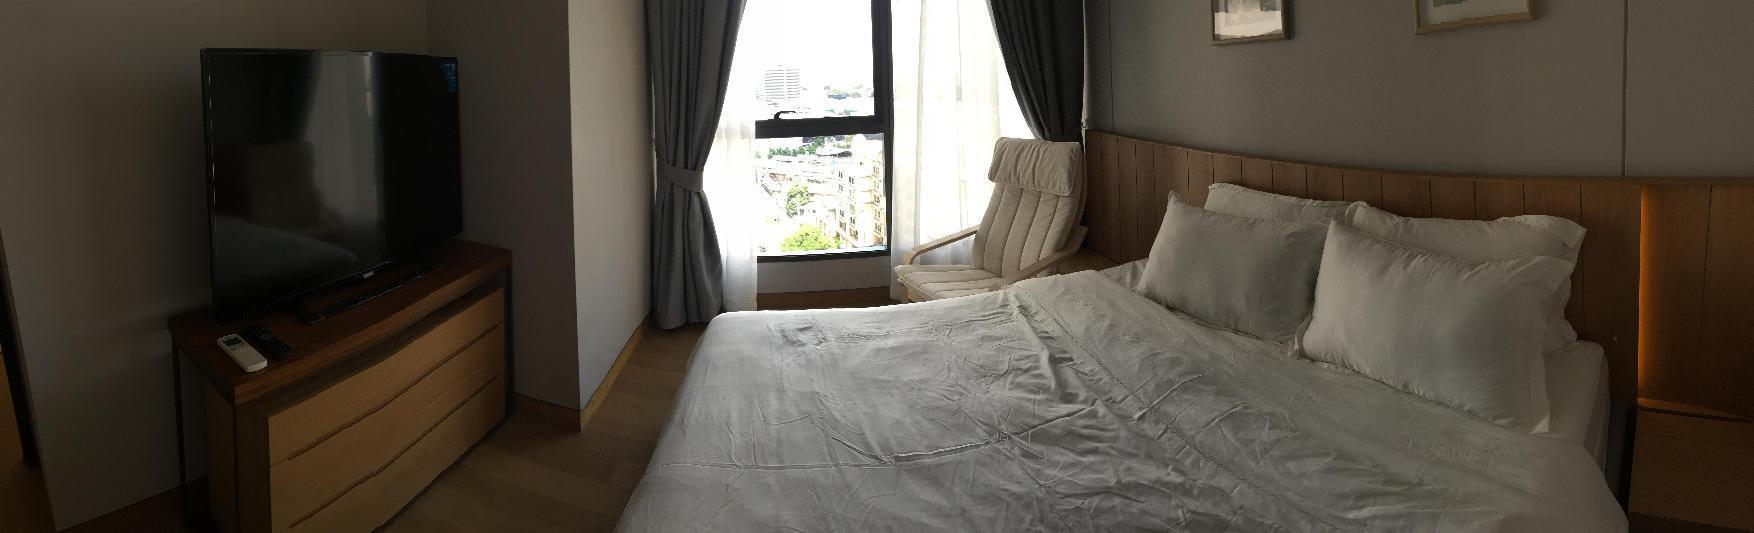 RE/MAX Properties Agency's SALE / RENT The Lumpini24 1 Bed 38 Sq.m at Sukhumvit 9